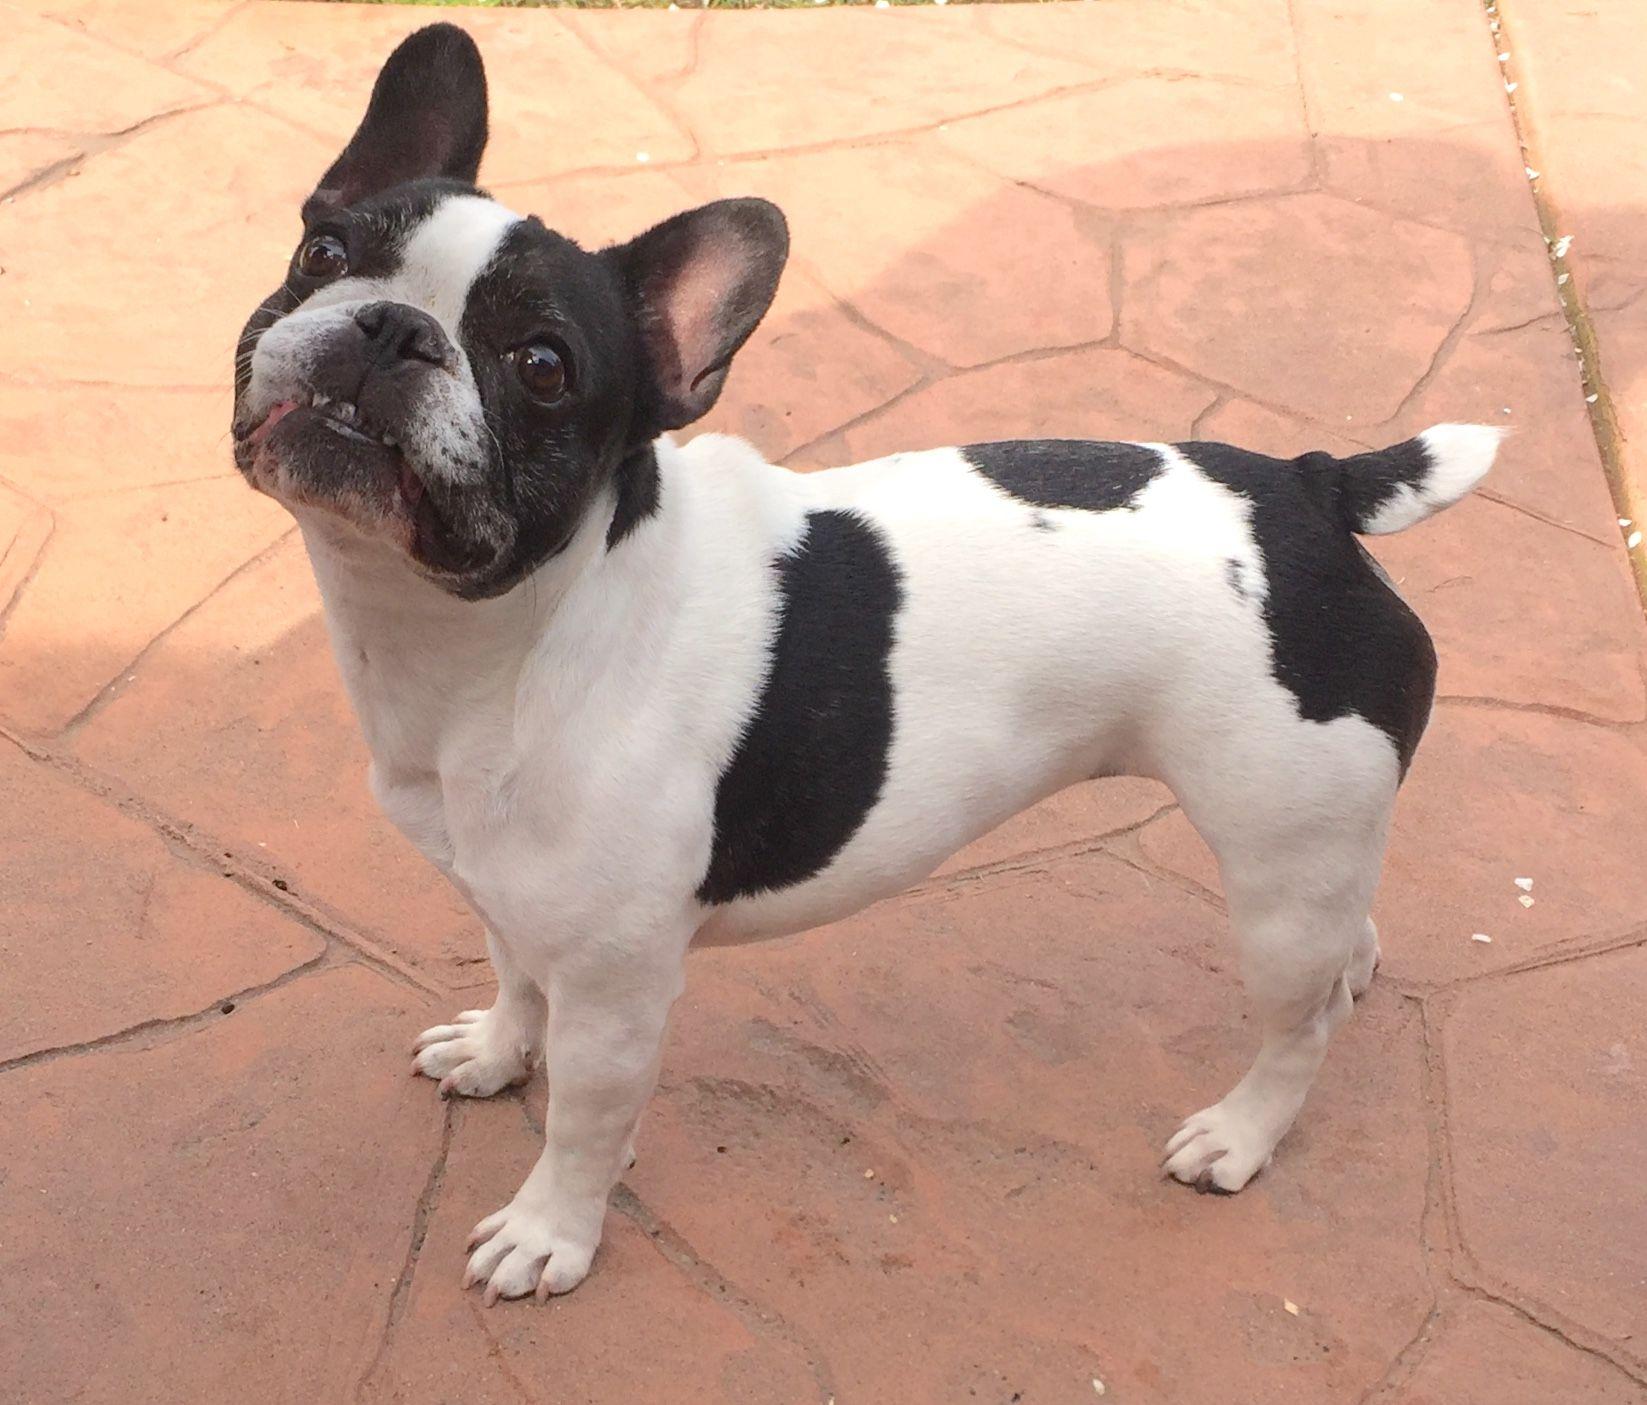 Pepper The Sassy French Bulldog Love Her Little Tail Cute French Bulldog French Bulldog Bulldog